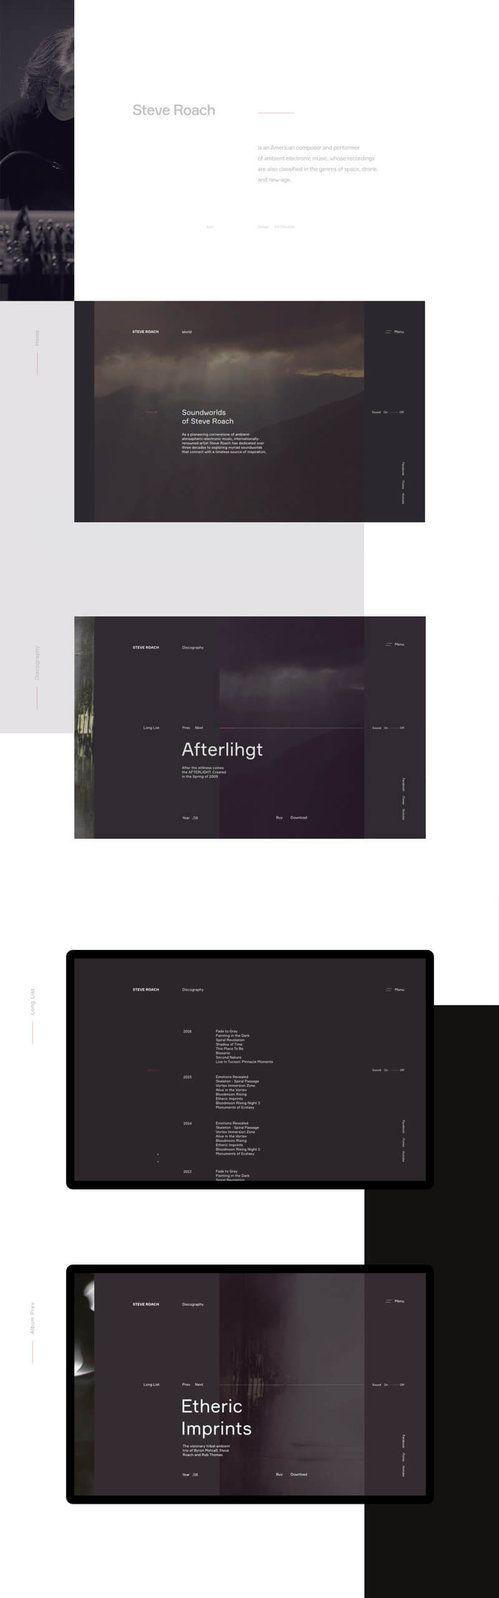 Steve-Roach1 #ui #ux #userexperience #website #webdesign #design